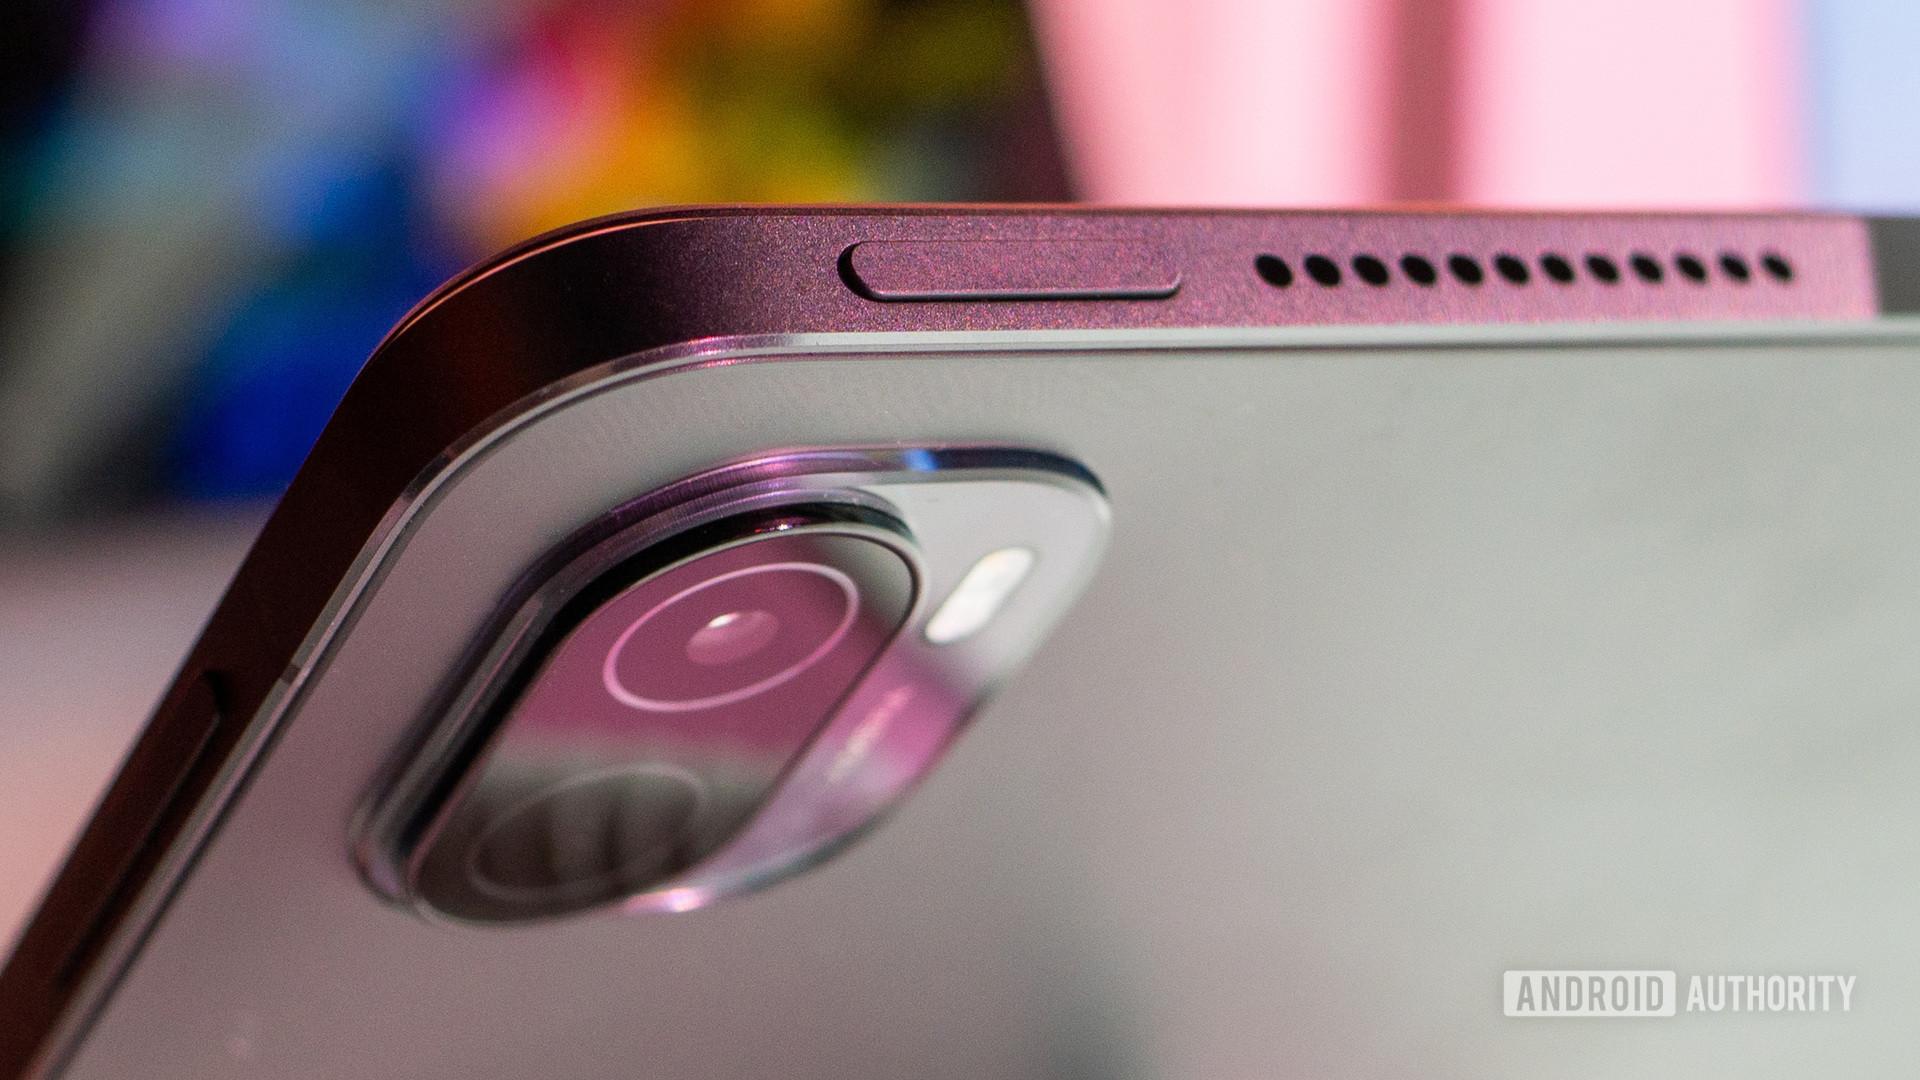 Xiaomi Pad 5 power button and camera closeup